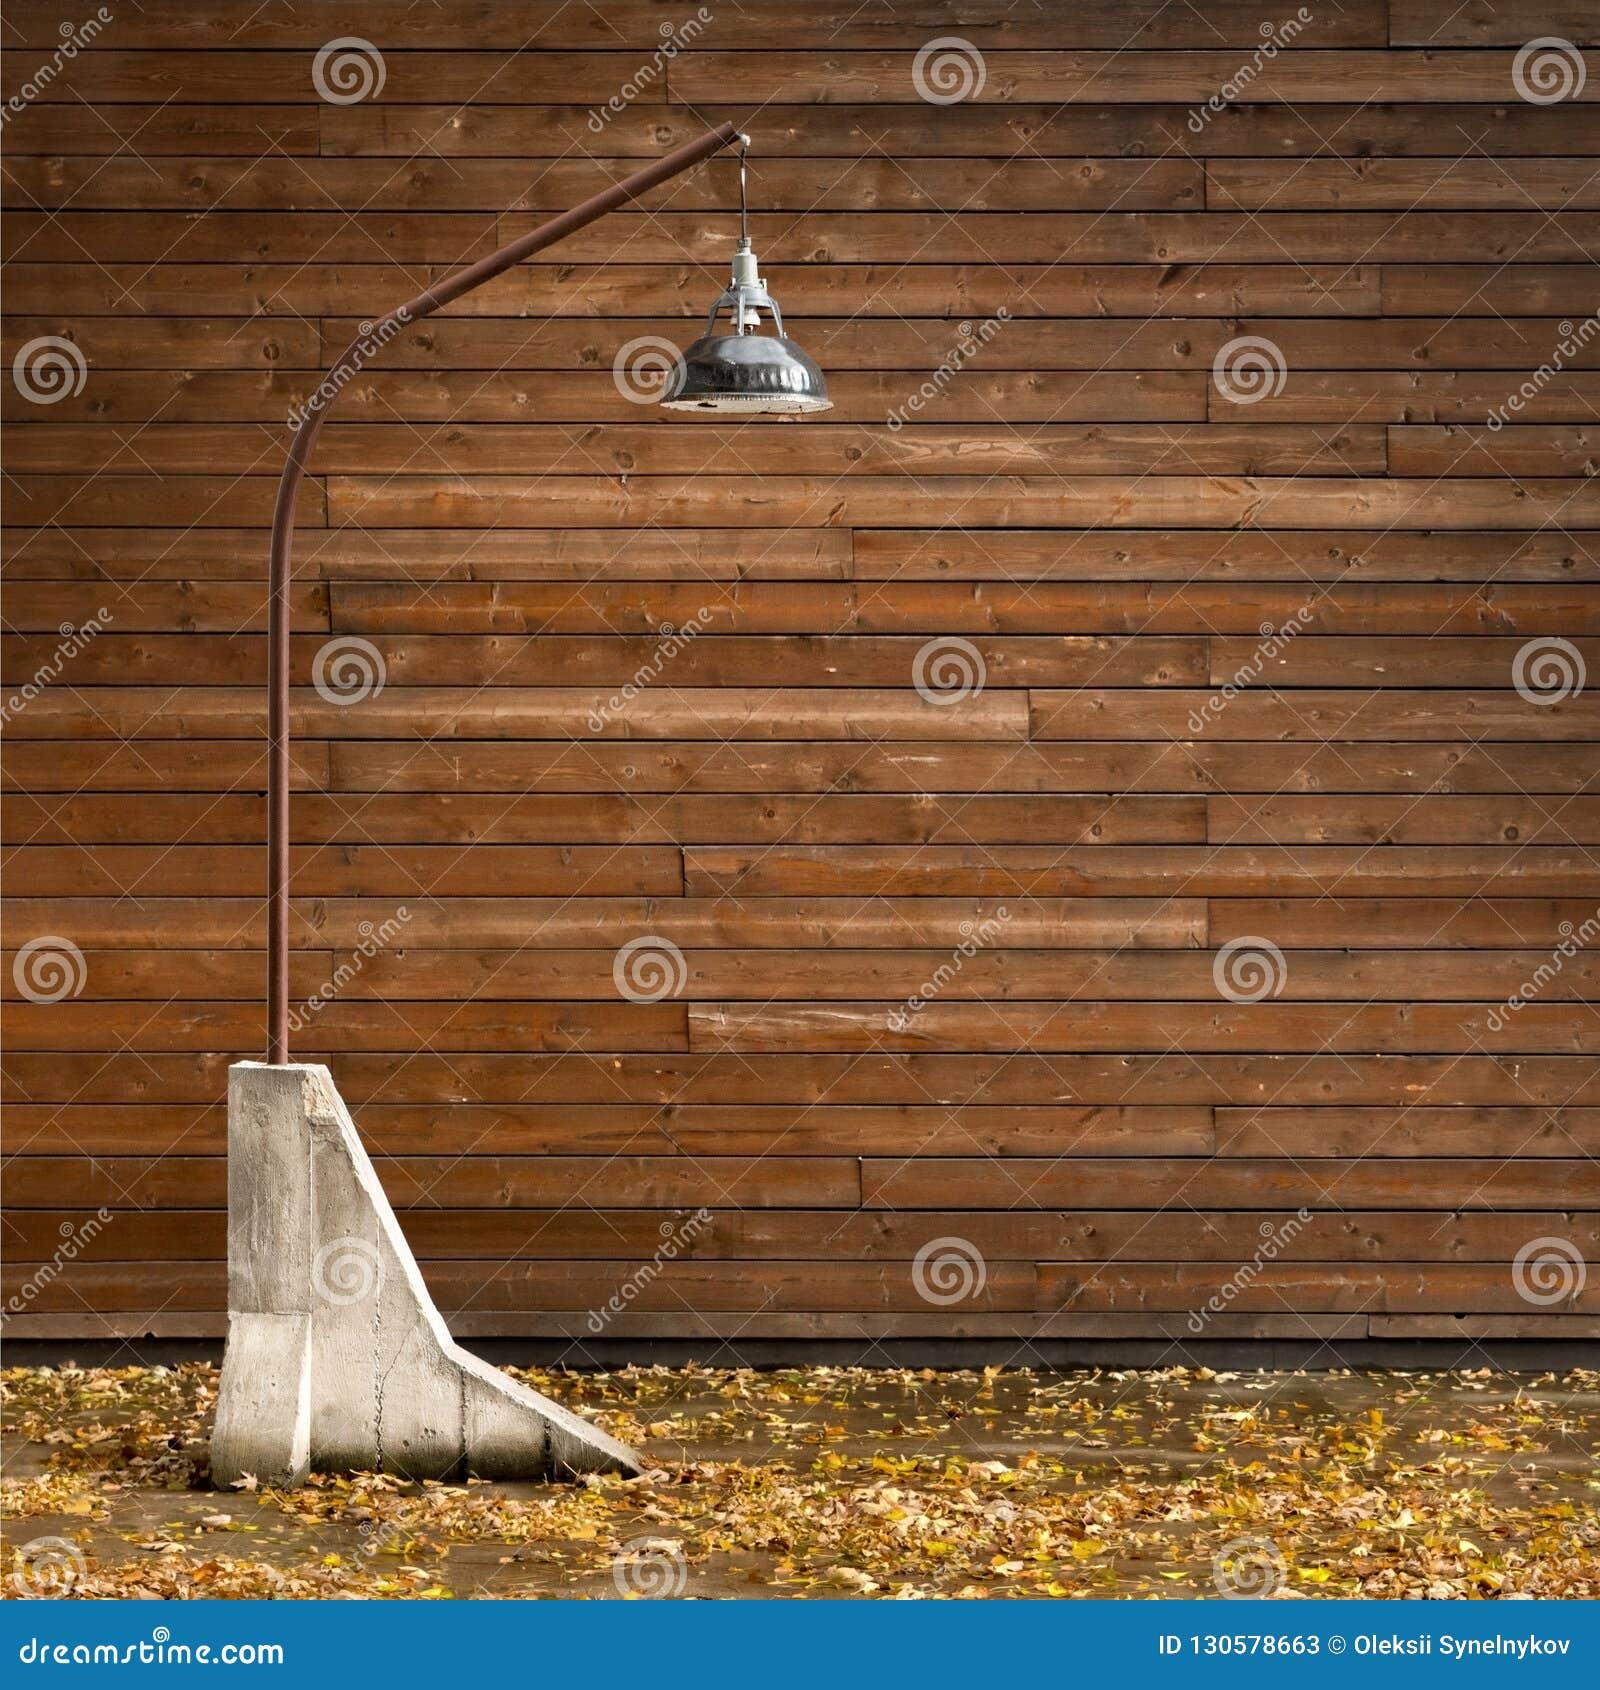 Image of: Modern Outdoor Lighting Concept Warm Lighting Melanholic Stock Image Image Of Grey Floor 130578663